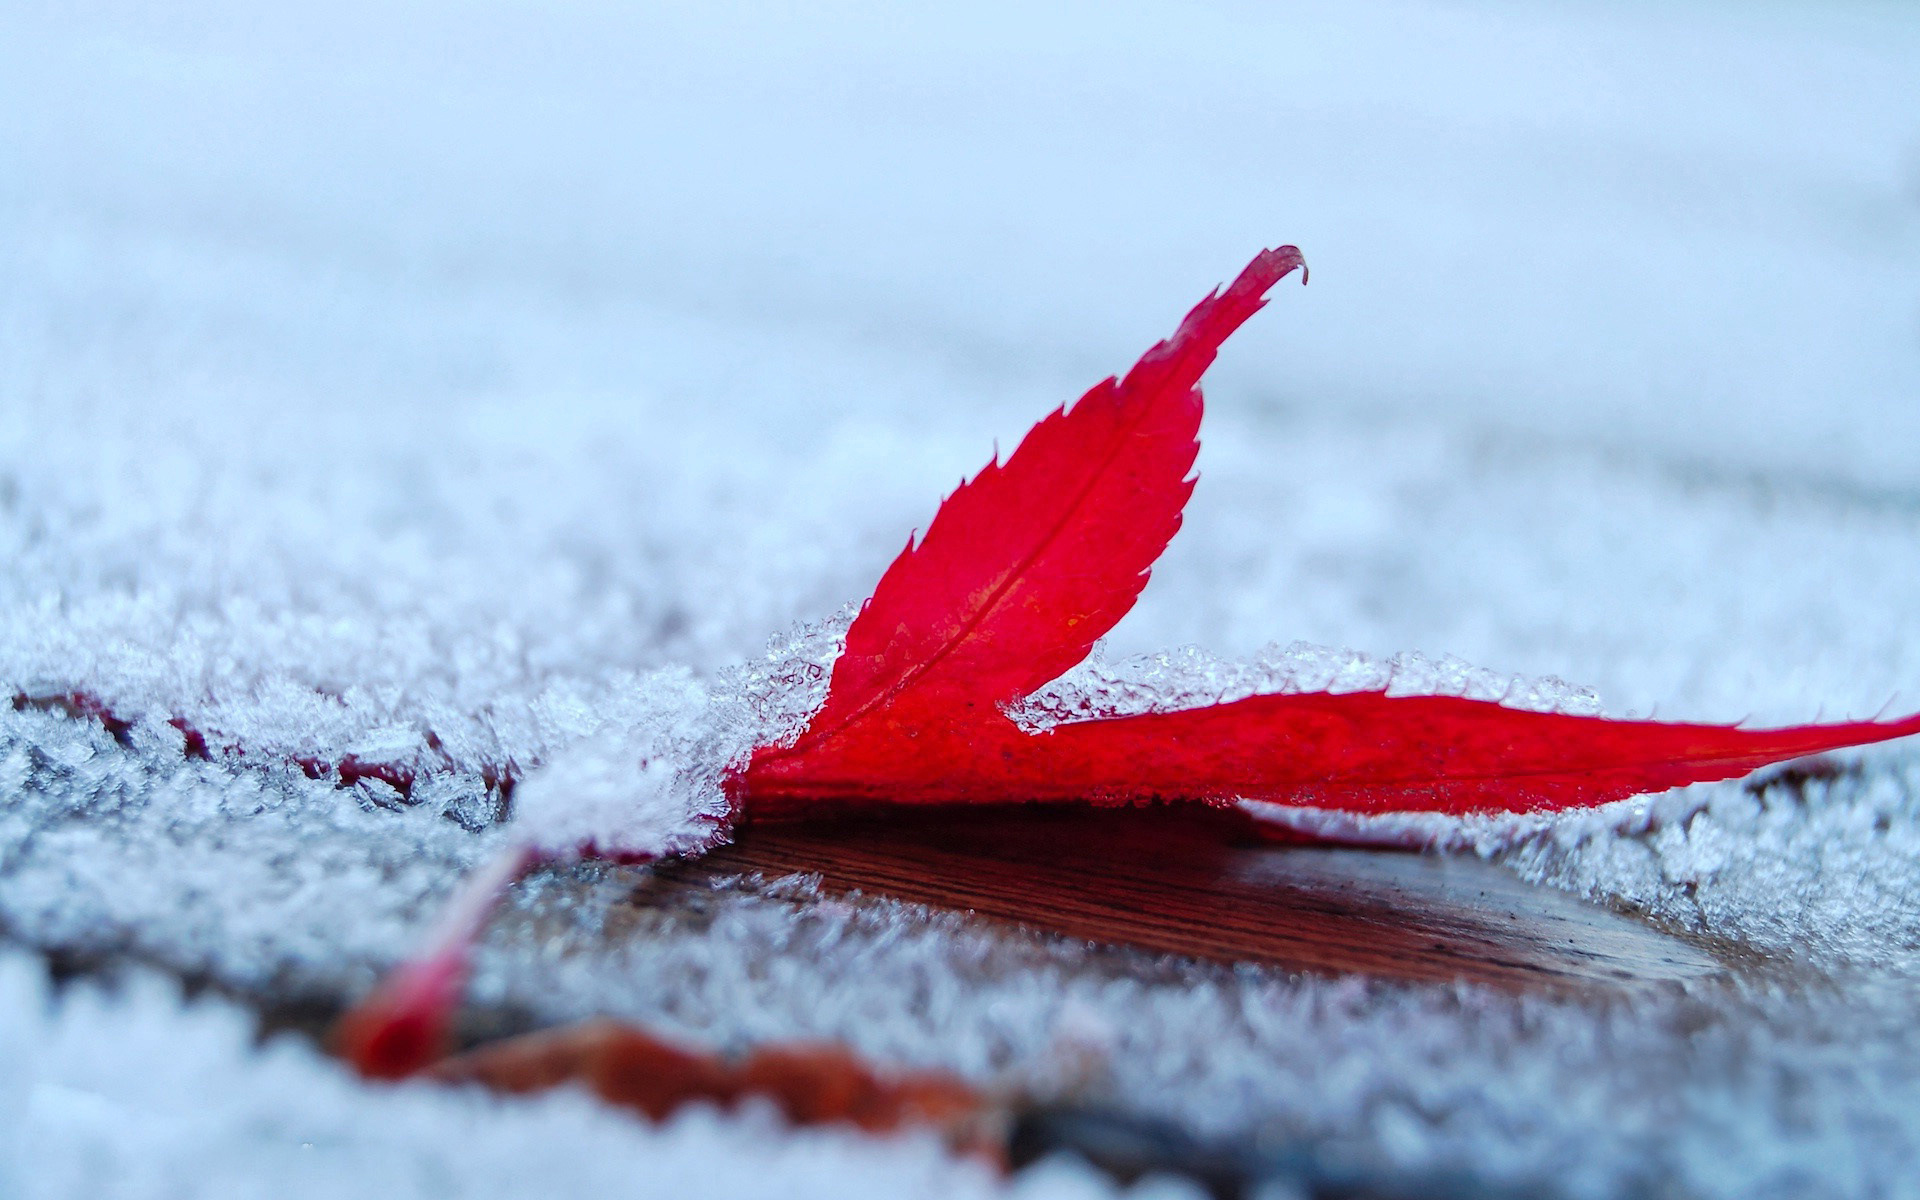 Falling Snow Wallpaper For Ipad Fall Wallpaper Free Free Wallpaper World